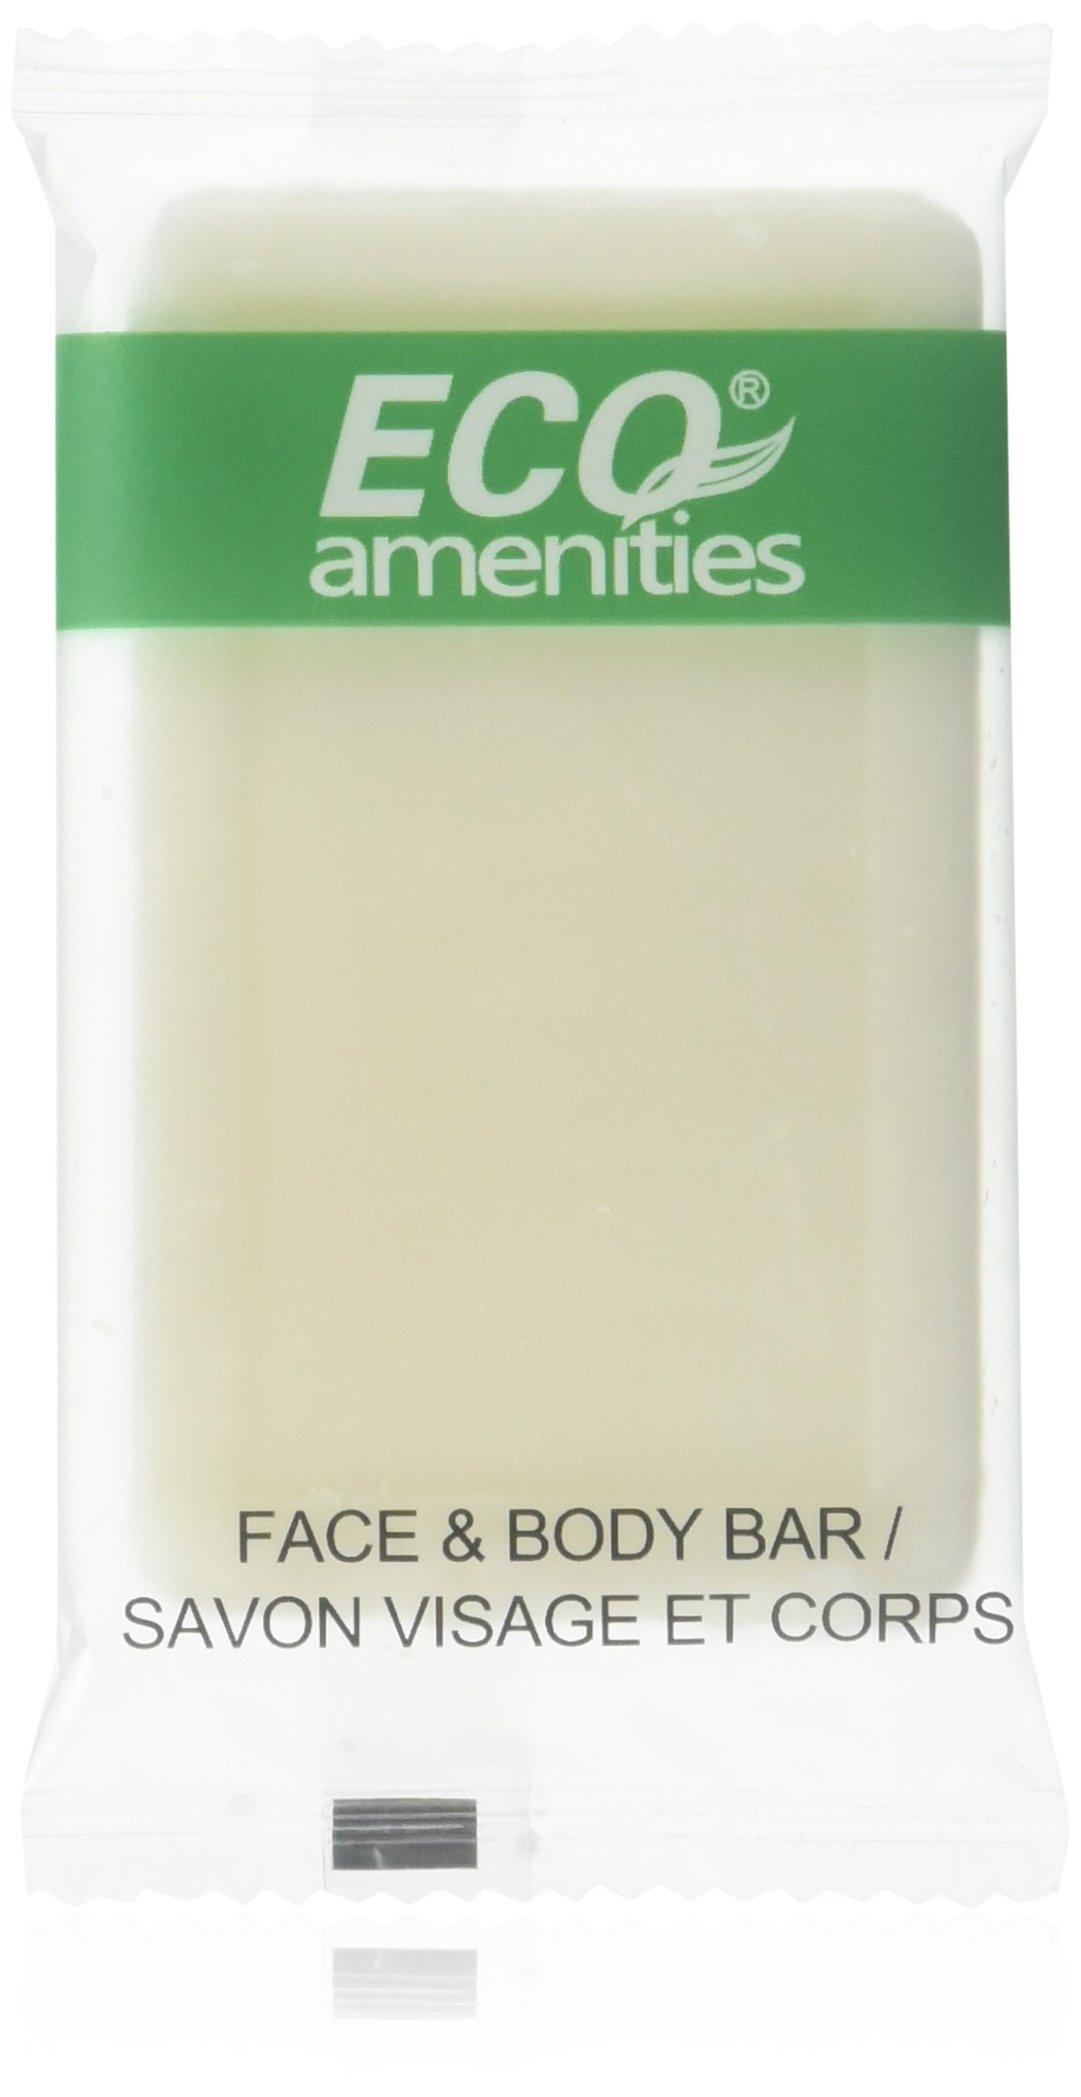 ECO AMENITIES Travel size 1oz hotel soap in bulk, White, Green Tea, 200 Count